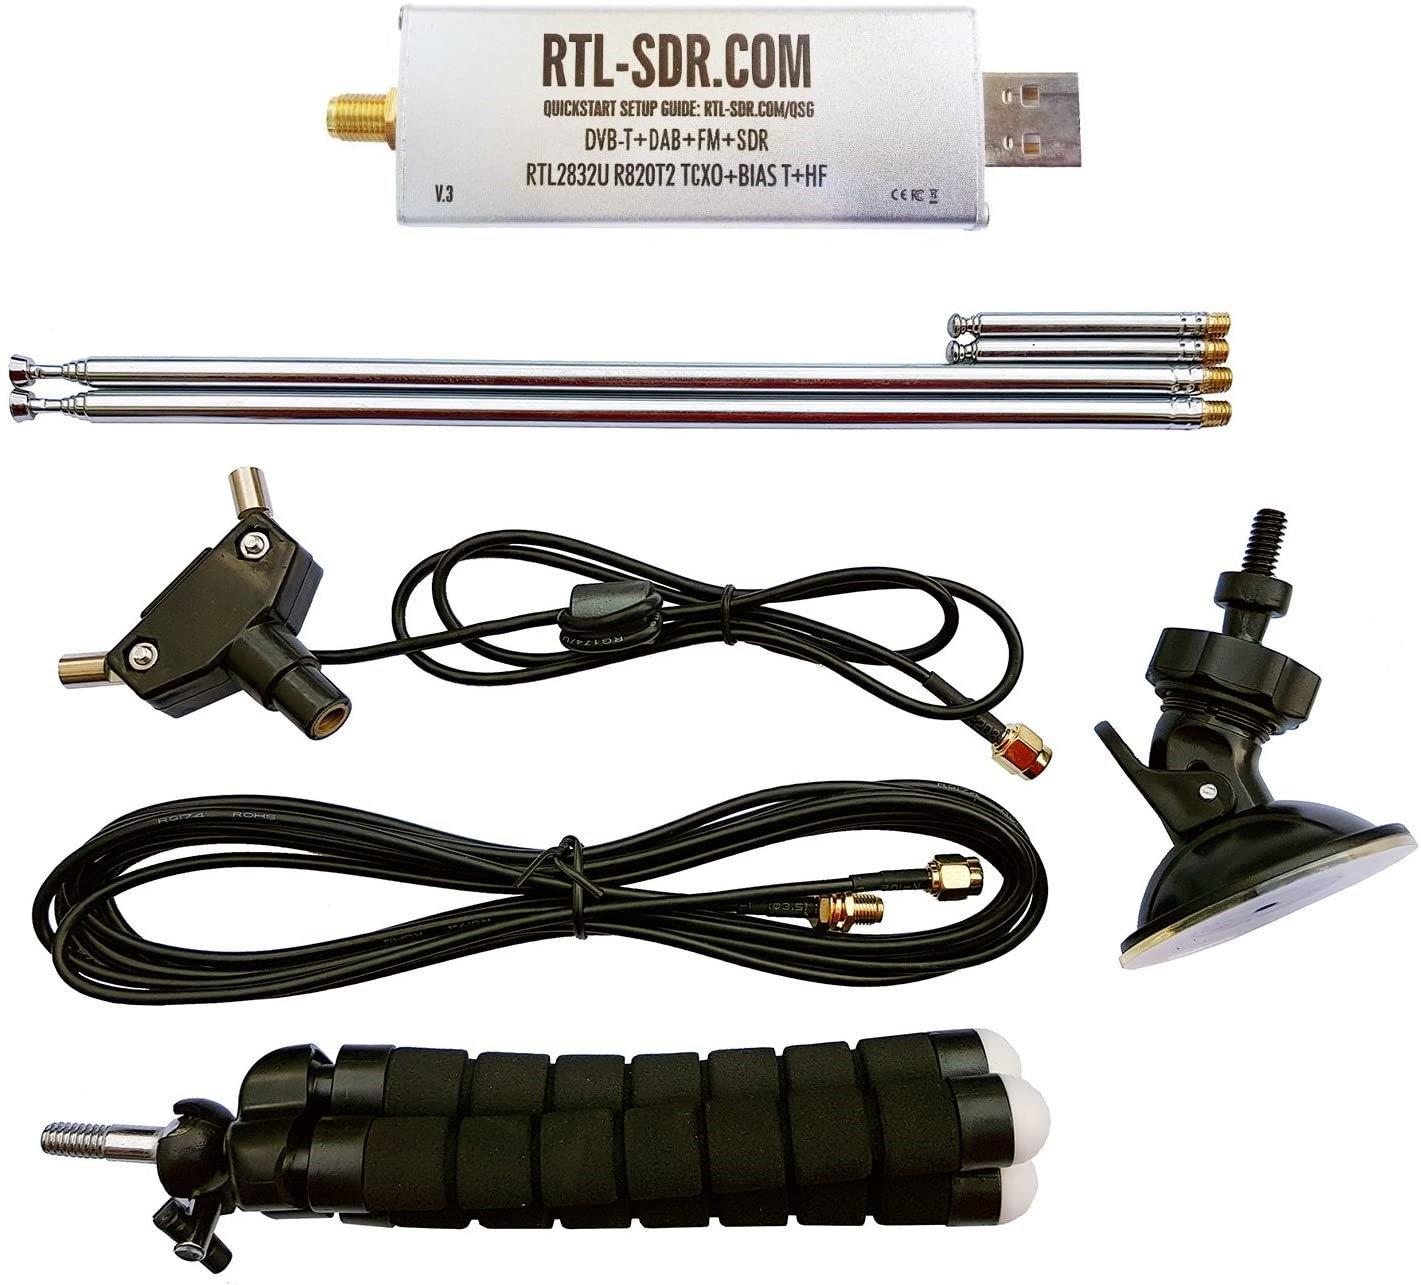 RTL-SDR Blog V3 SDR with Dipole Antenna Kit